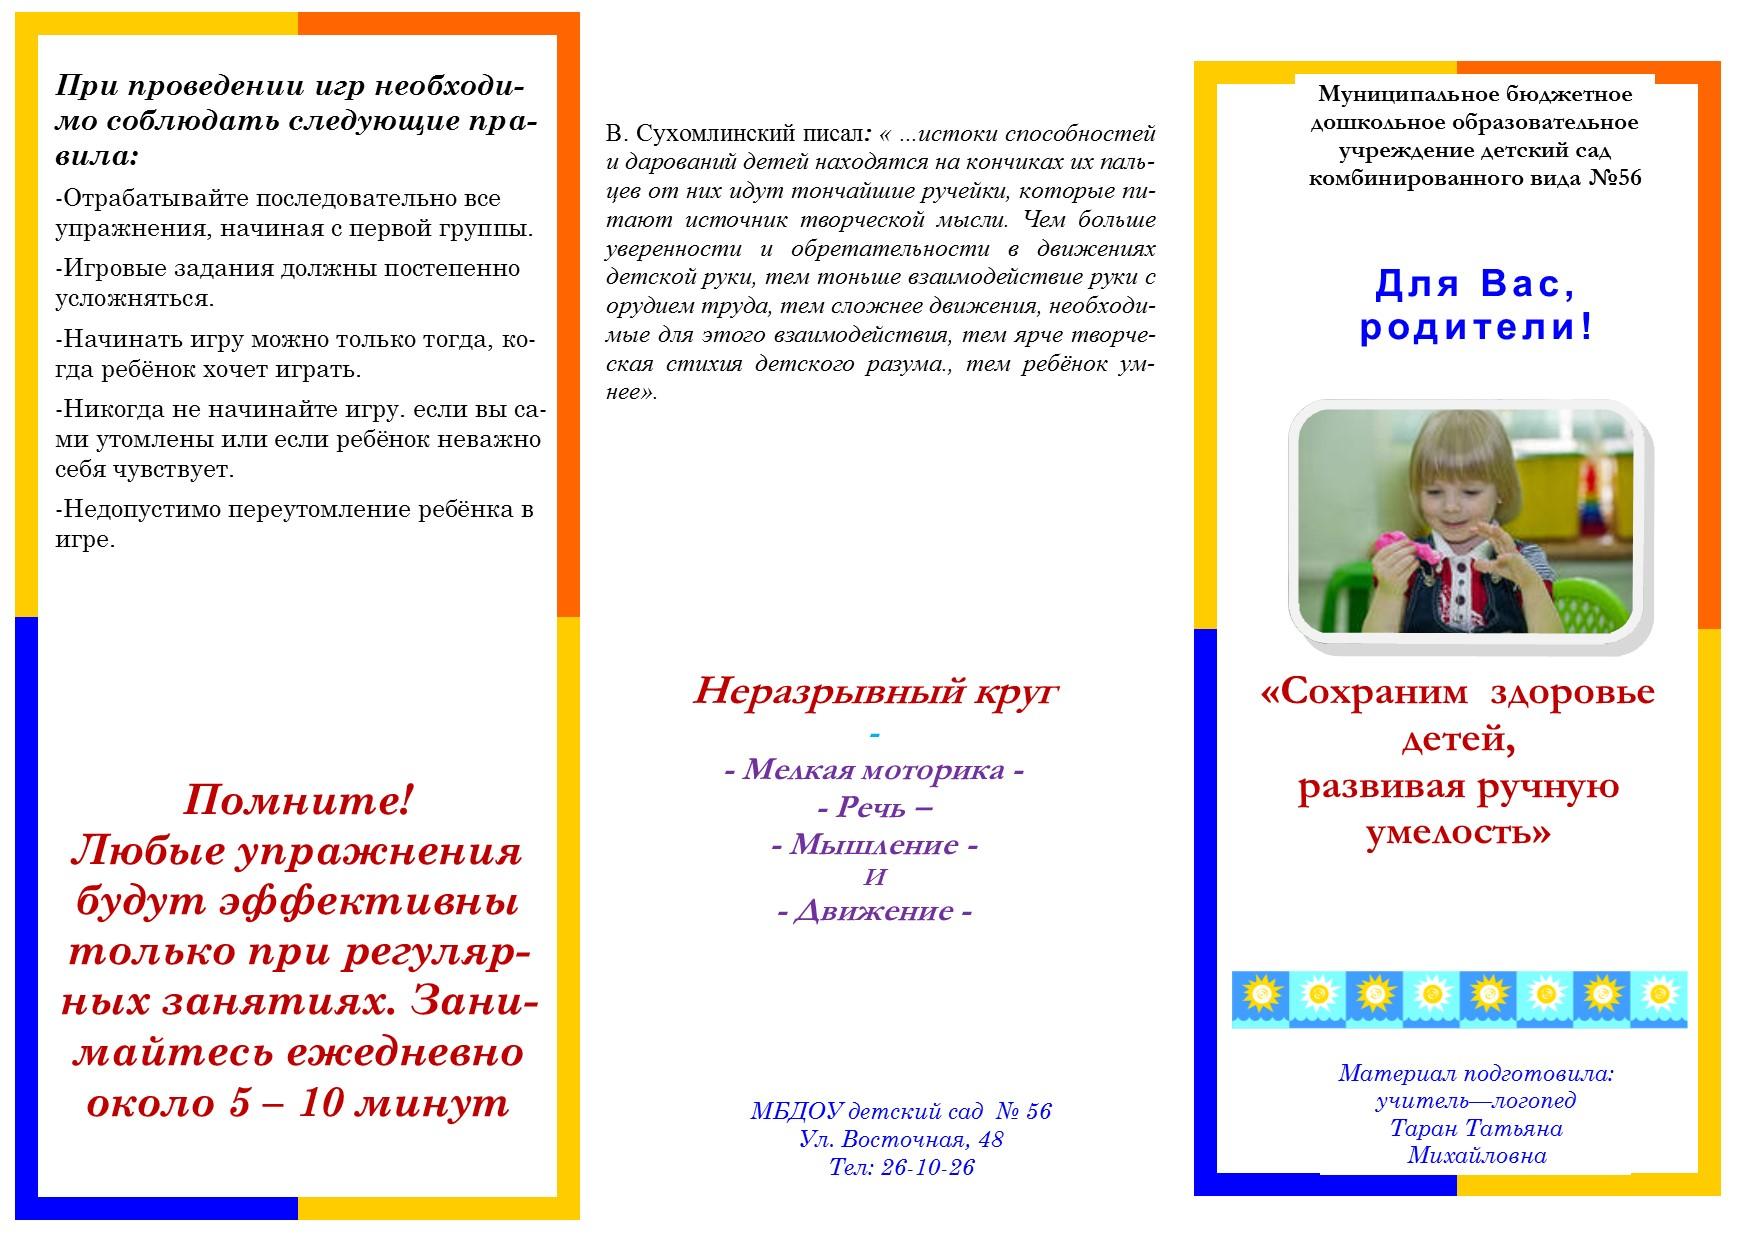 C:\Users\intelcore3\Desktop\Буклет-Таран-Т.М..jpg